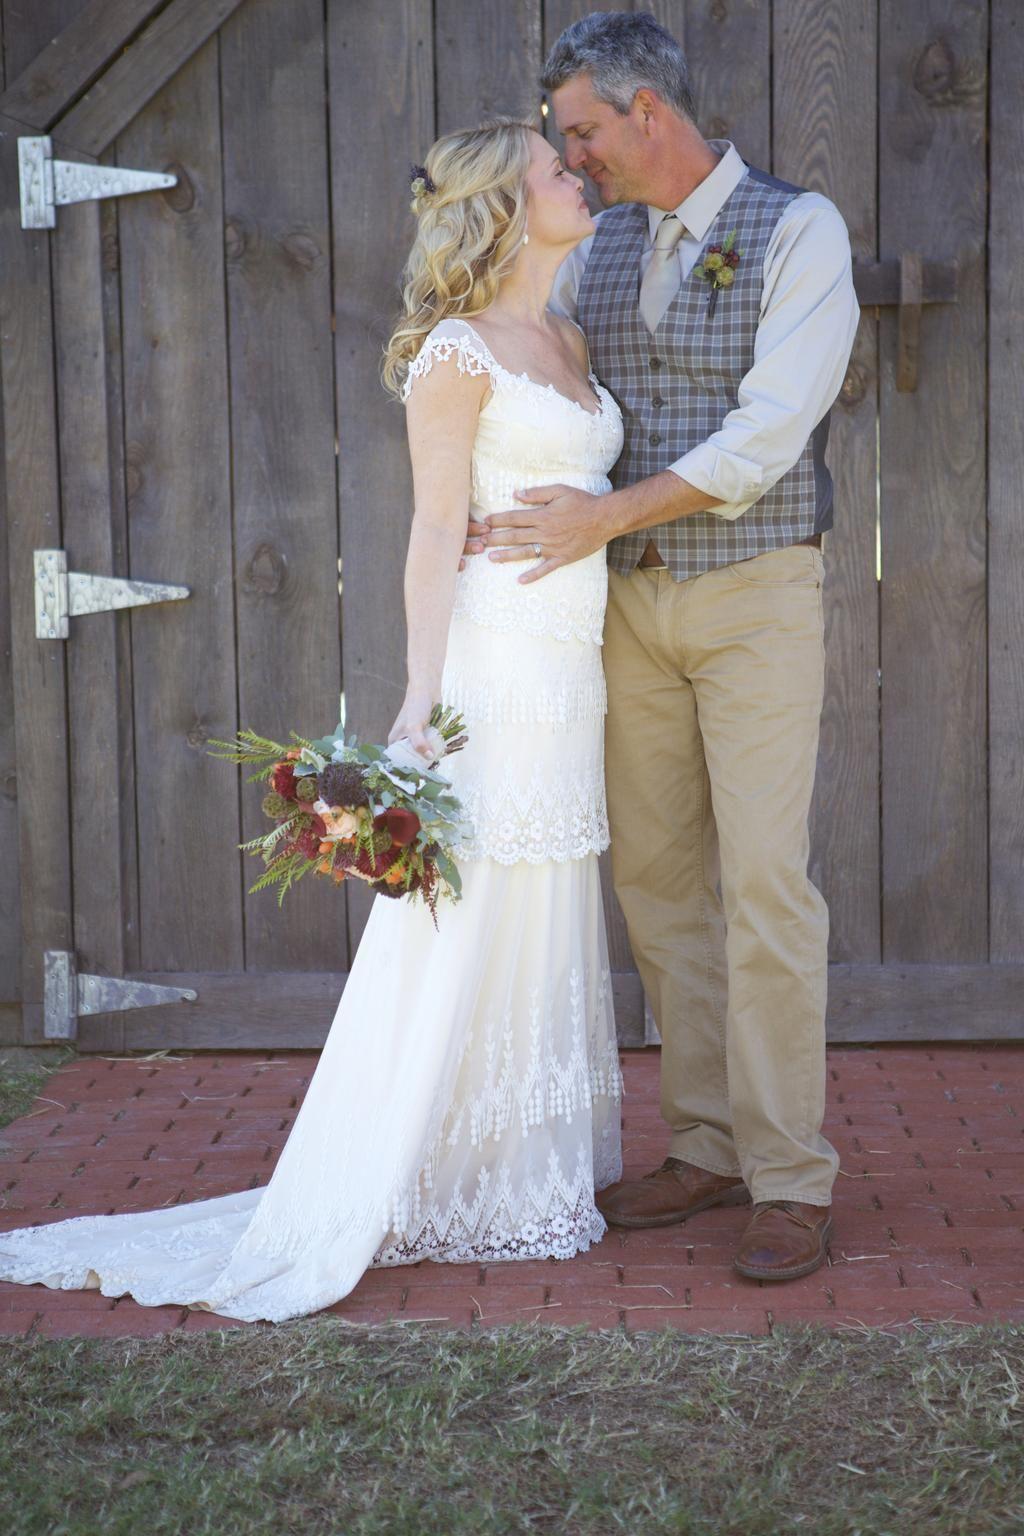 Claire Pettibone Kristene Wedding Dress Used Twice, Size